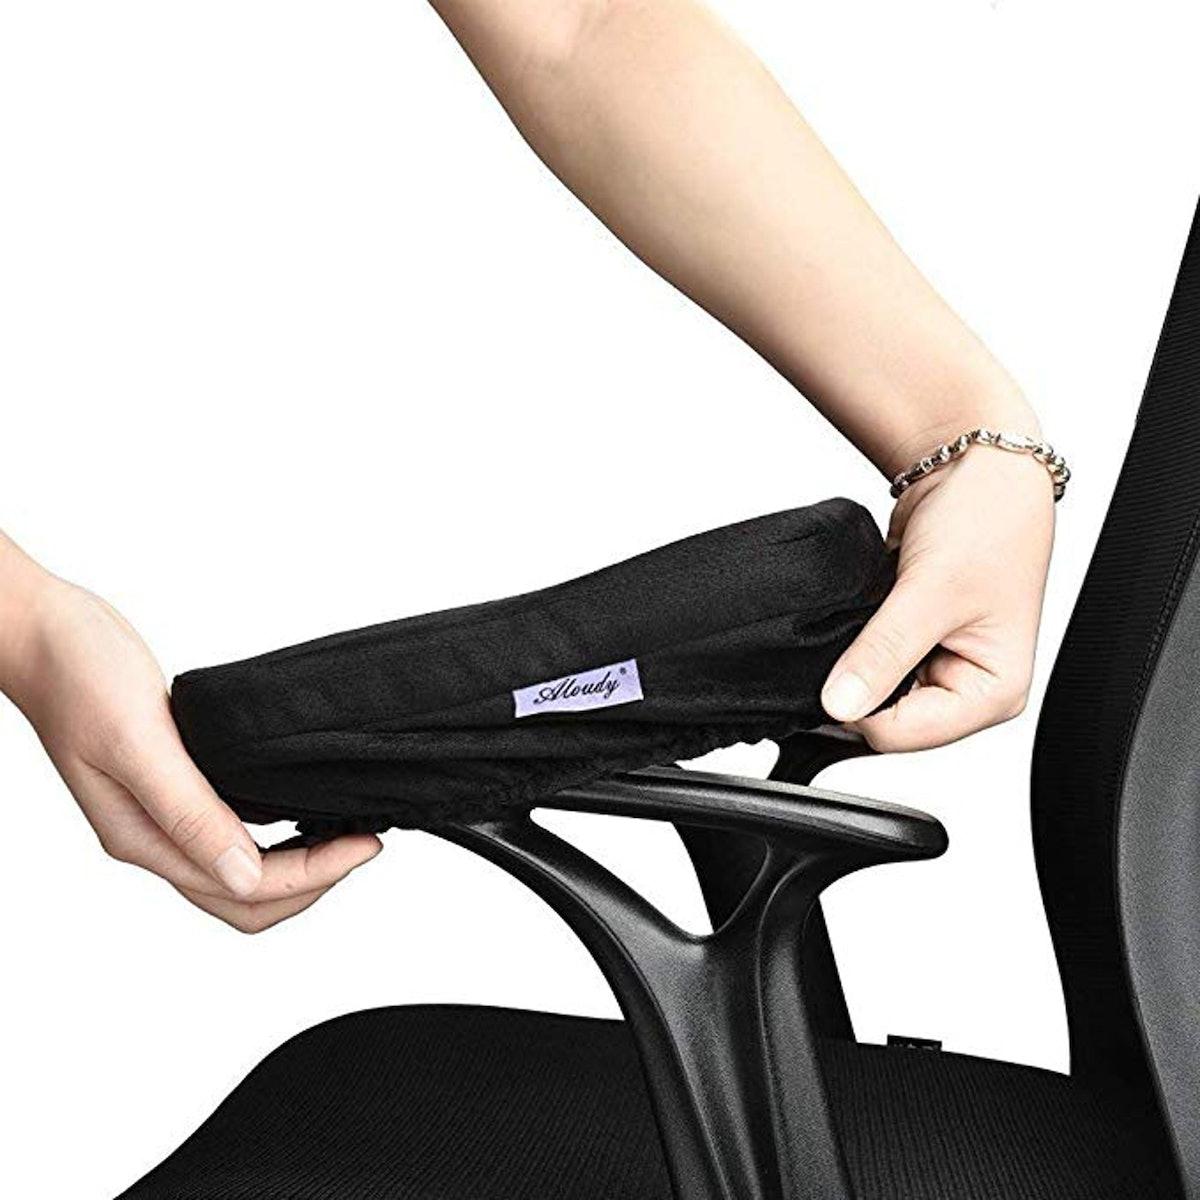 Aloudy Ergonomic Memory Foam Office Chair Armrest Pads